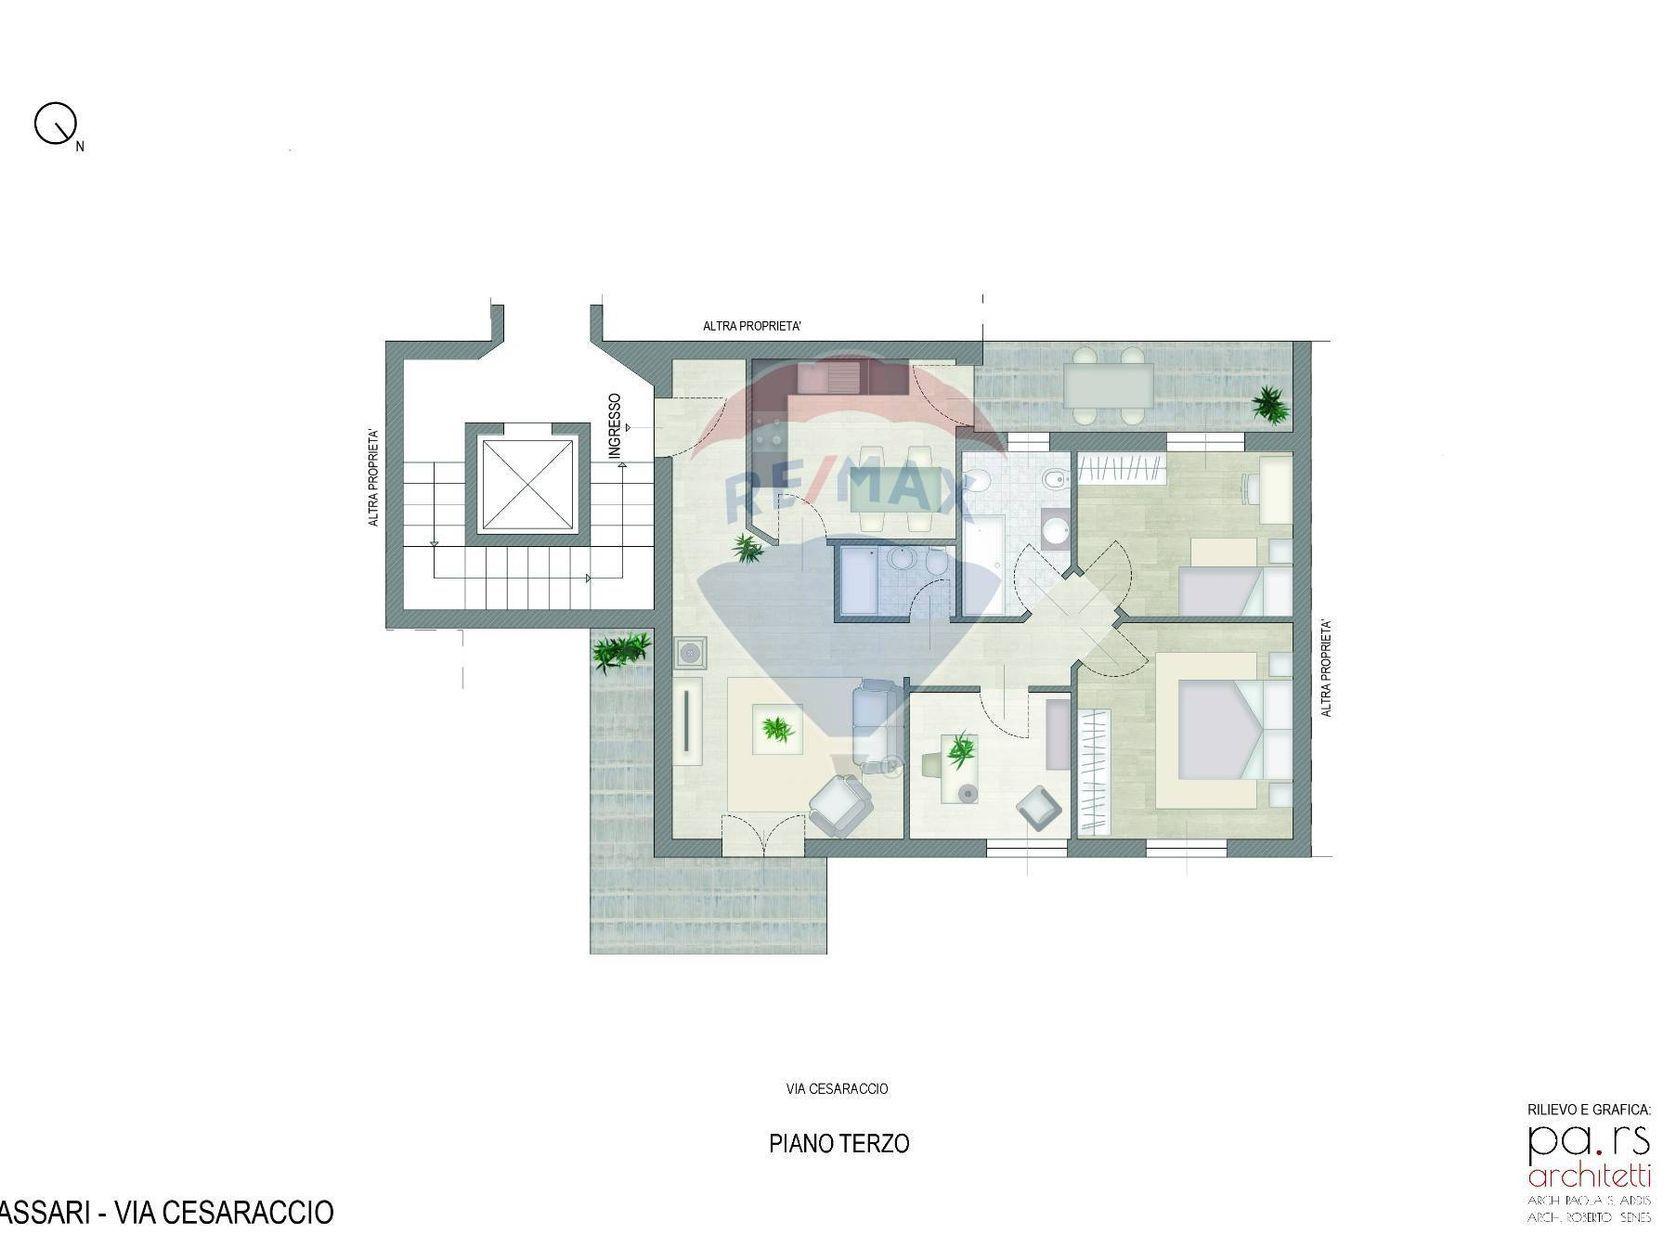 Appartamento Ss-s. Orsola Storica, Sassari, SS Vendita - Planimetria 1